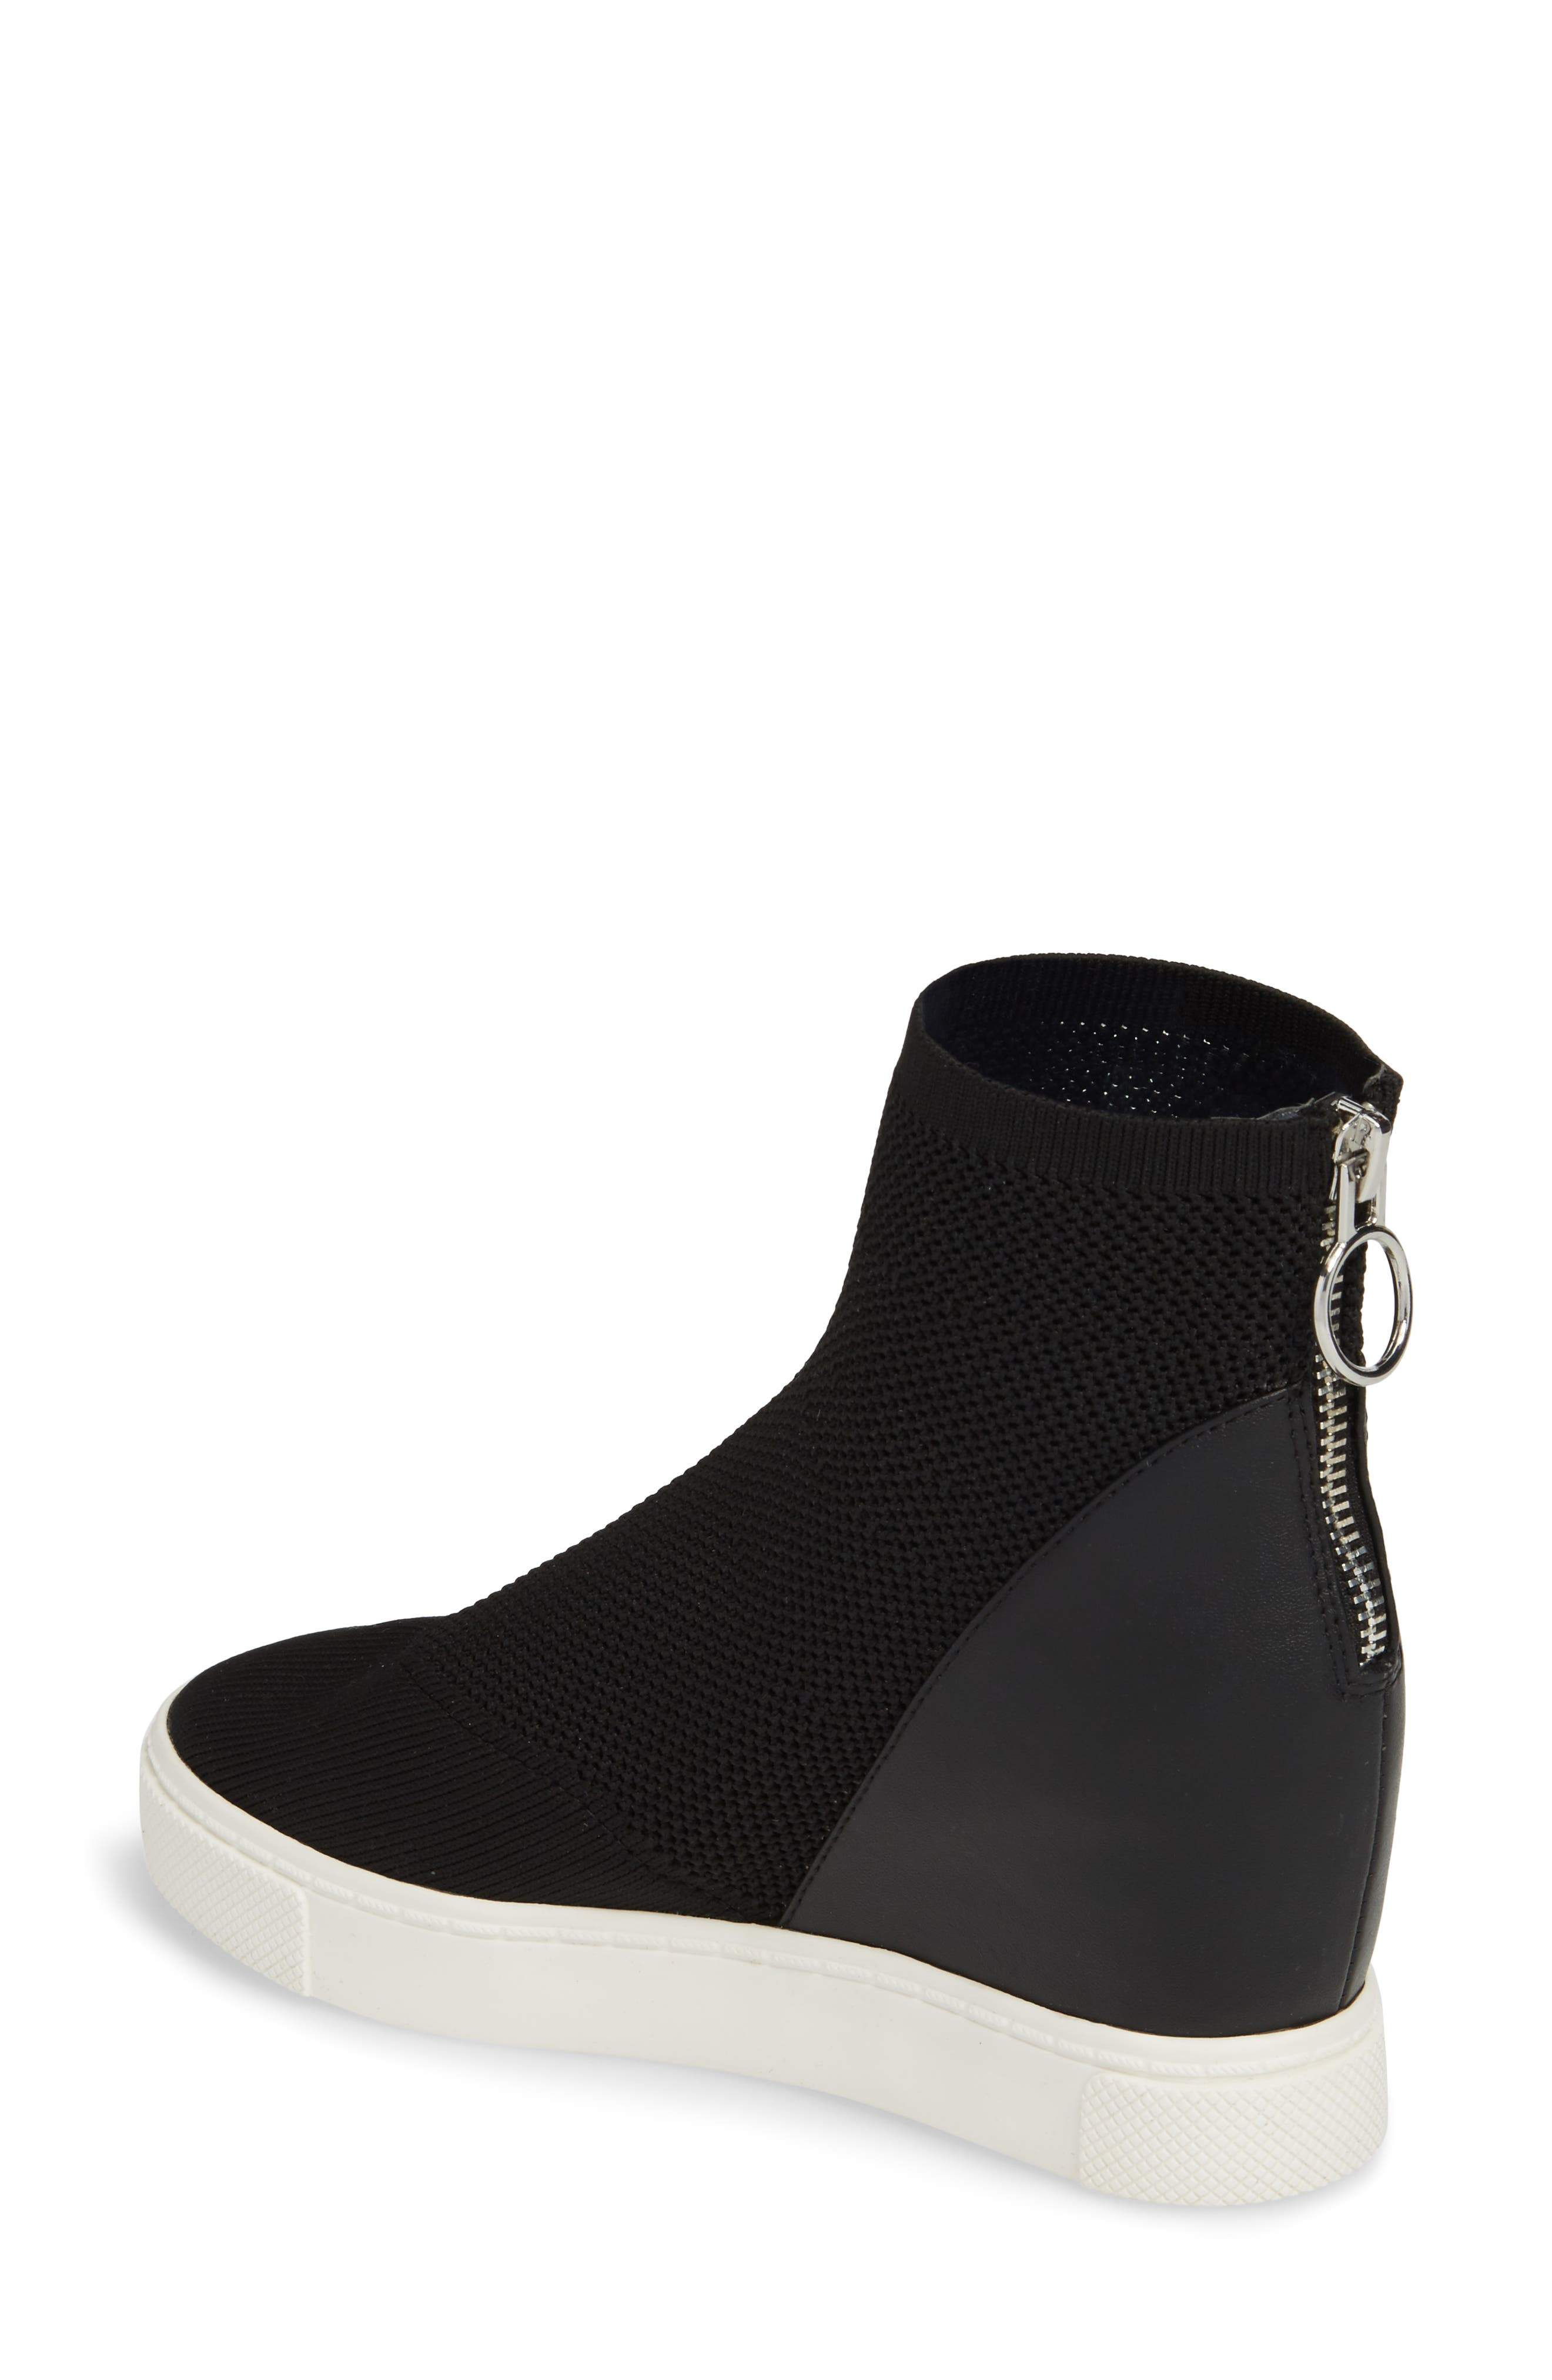 Lizzy Sneaker Bootie,                             Alternate thumbnail 2, color,                             Black